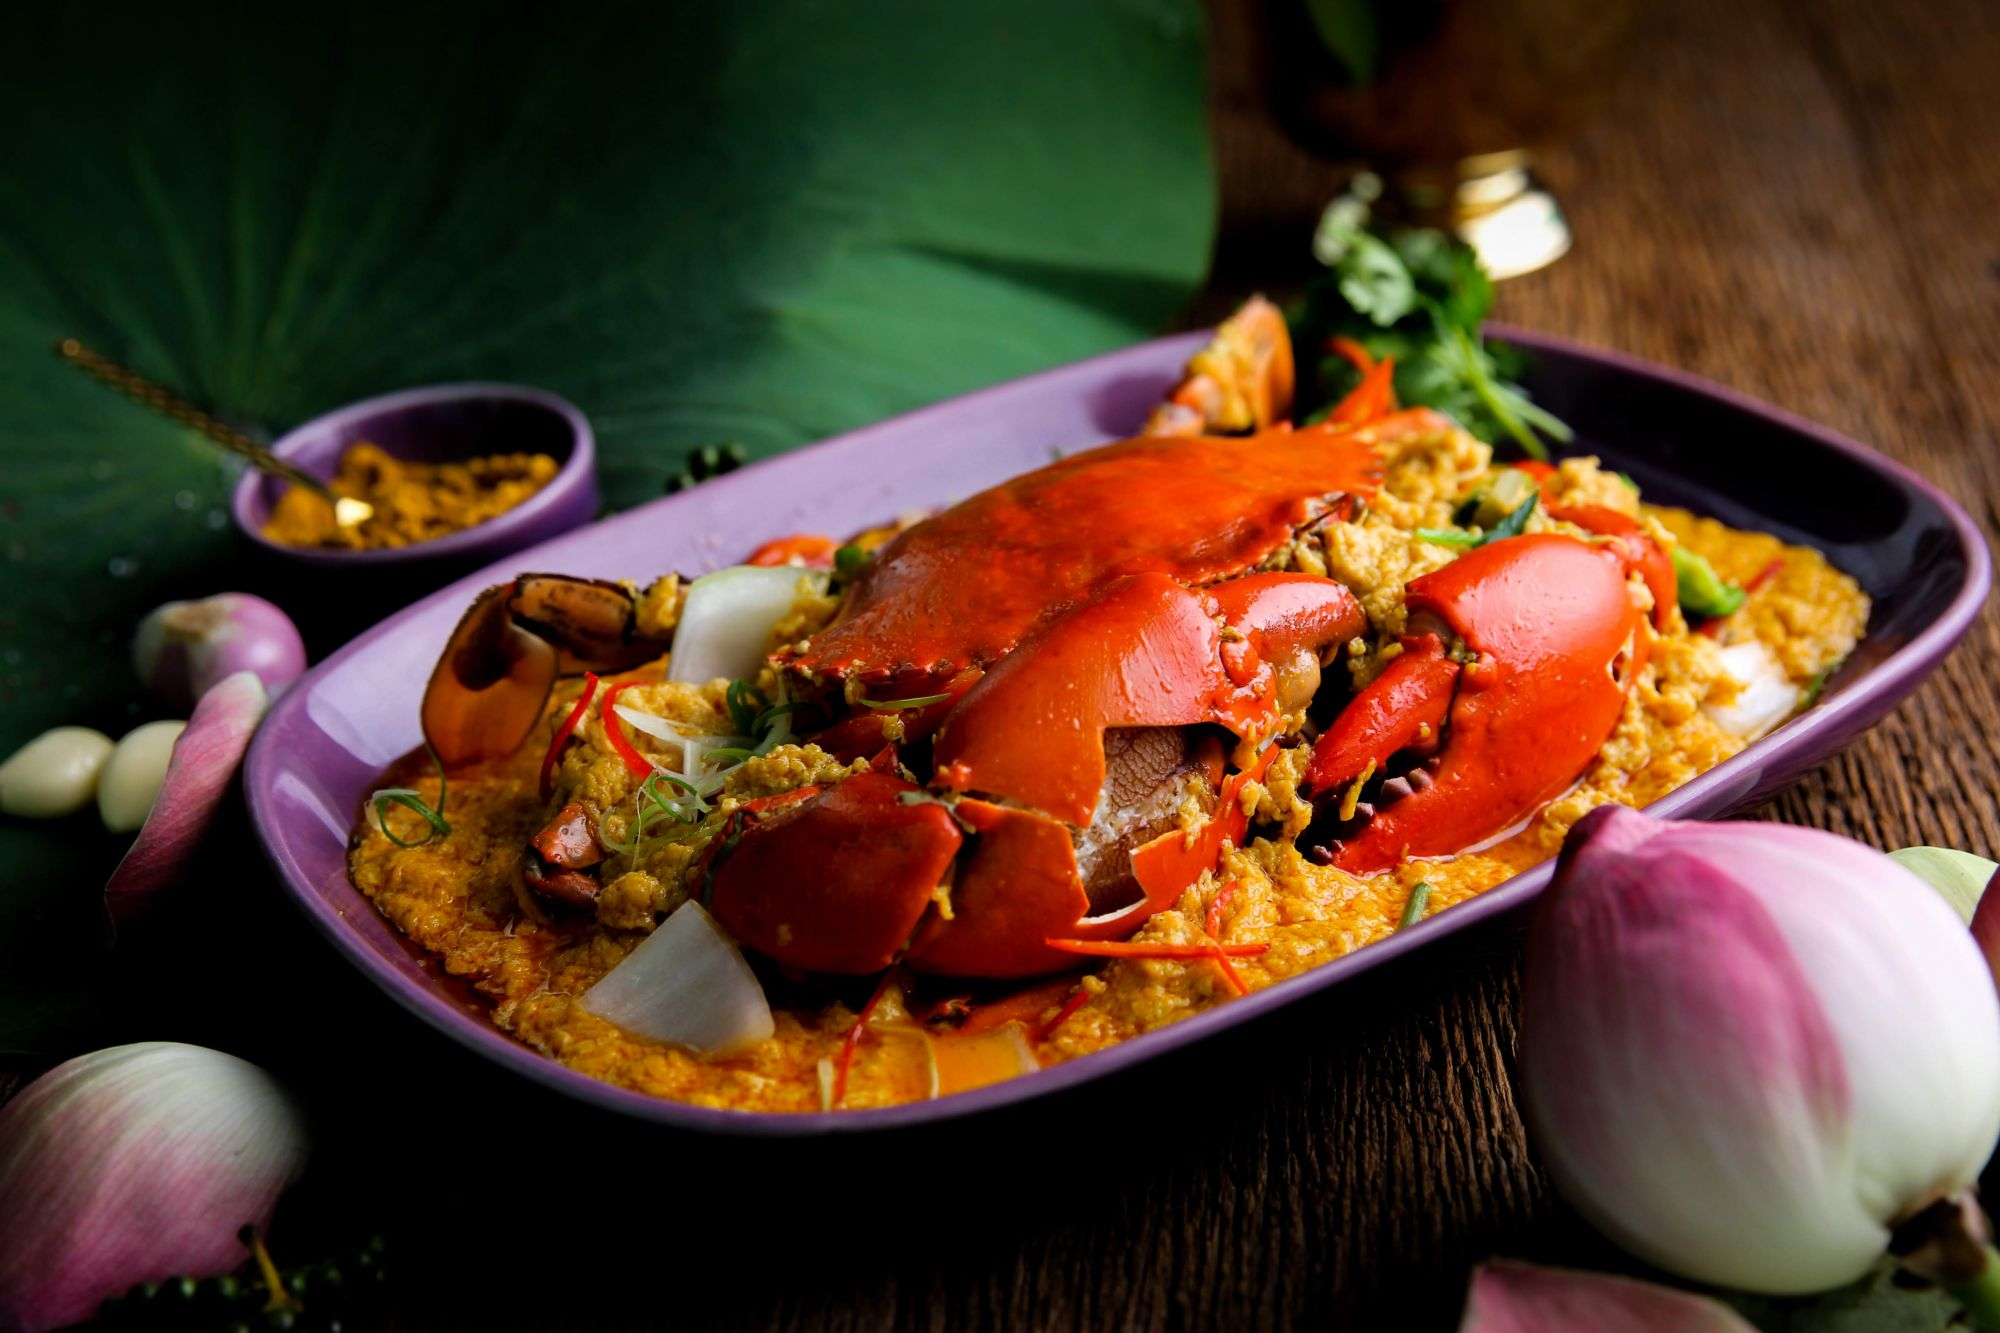 A Taste Of True Thailand Cuisine: Nara